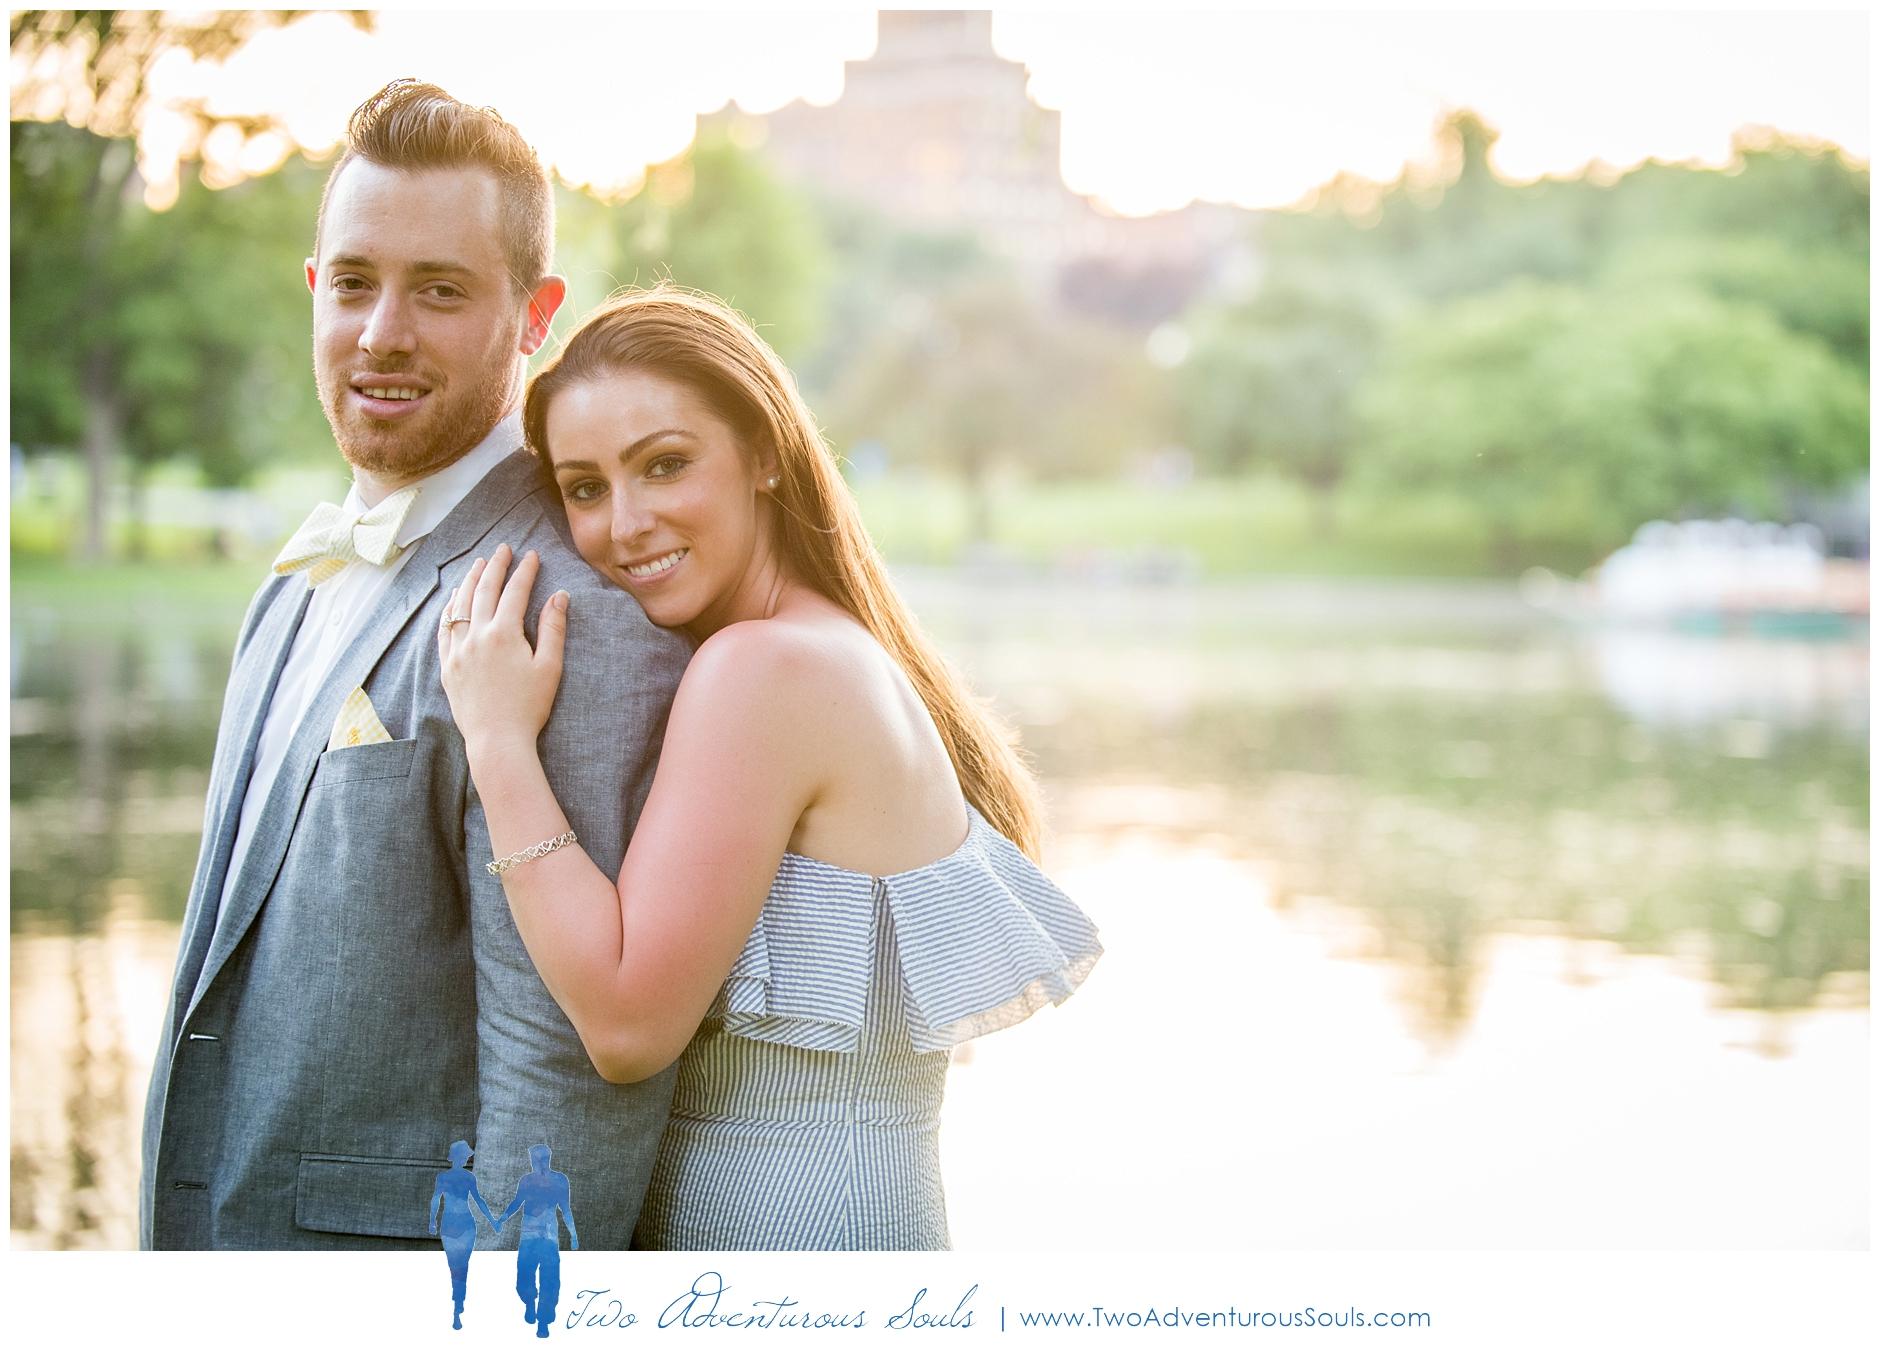 061117-Nicole-Zak-90_WEB-Maine-Wedding-and-Portrait-Photographer.jpg